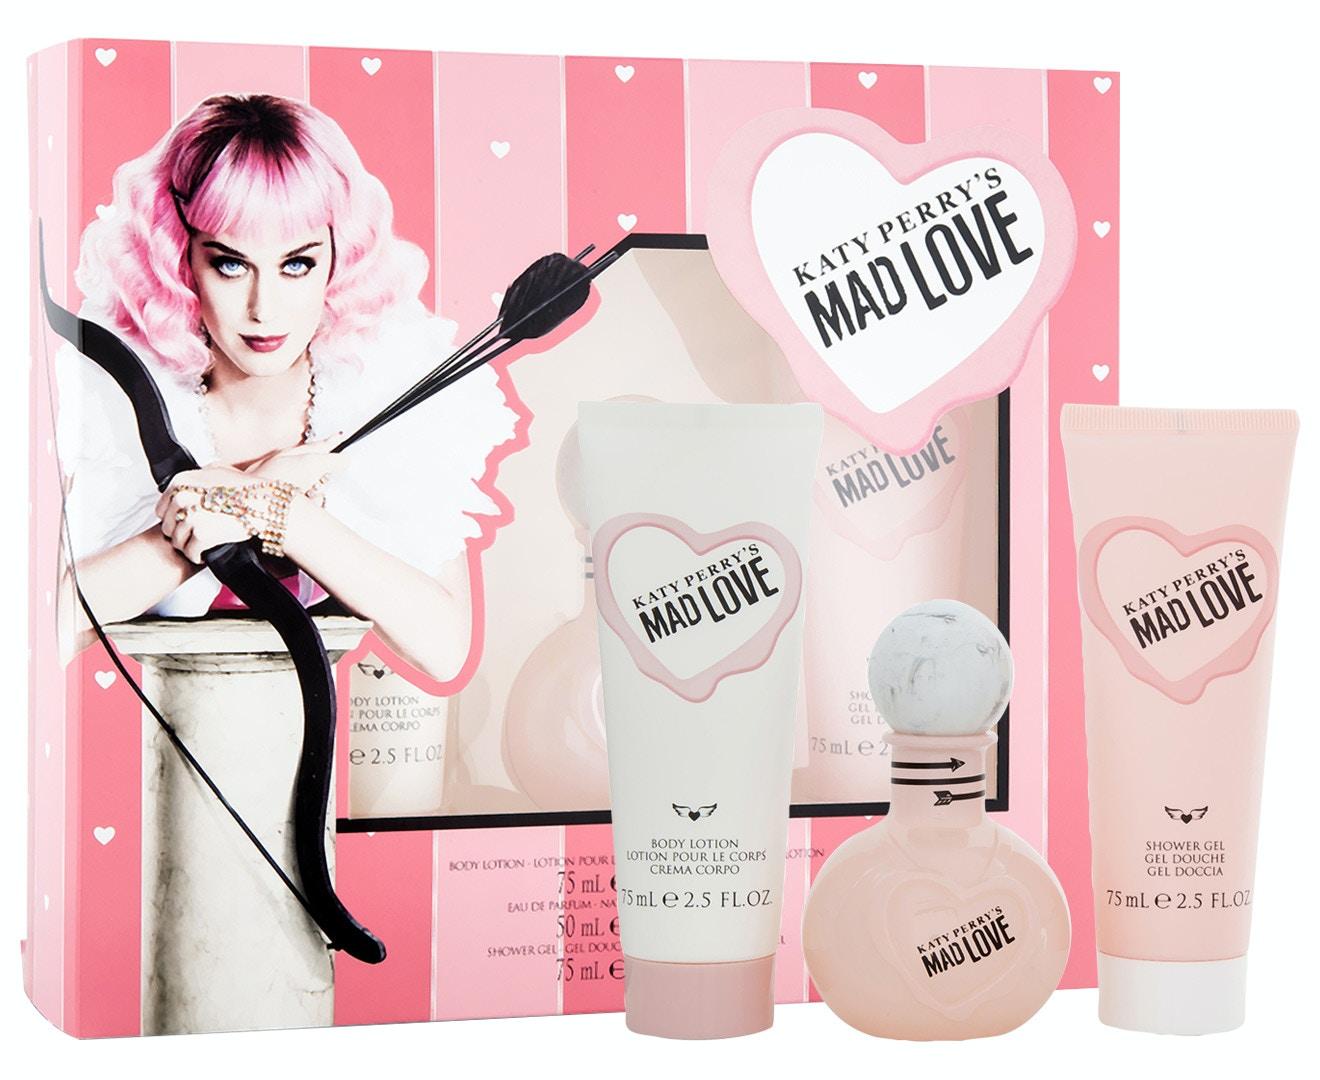 Katy Perry Mad Love Eau De Parfum Gift Set 50ml The Fragrance Shop The Fragrance Shop